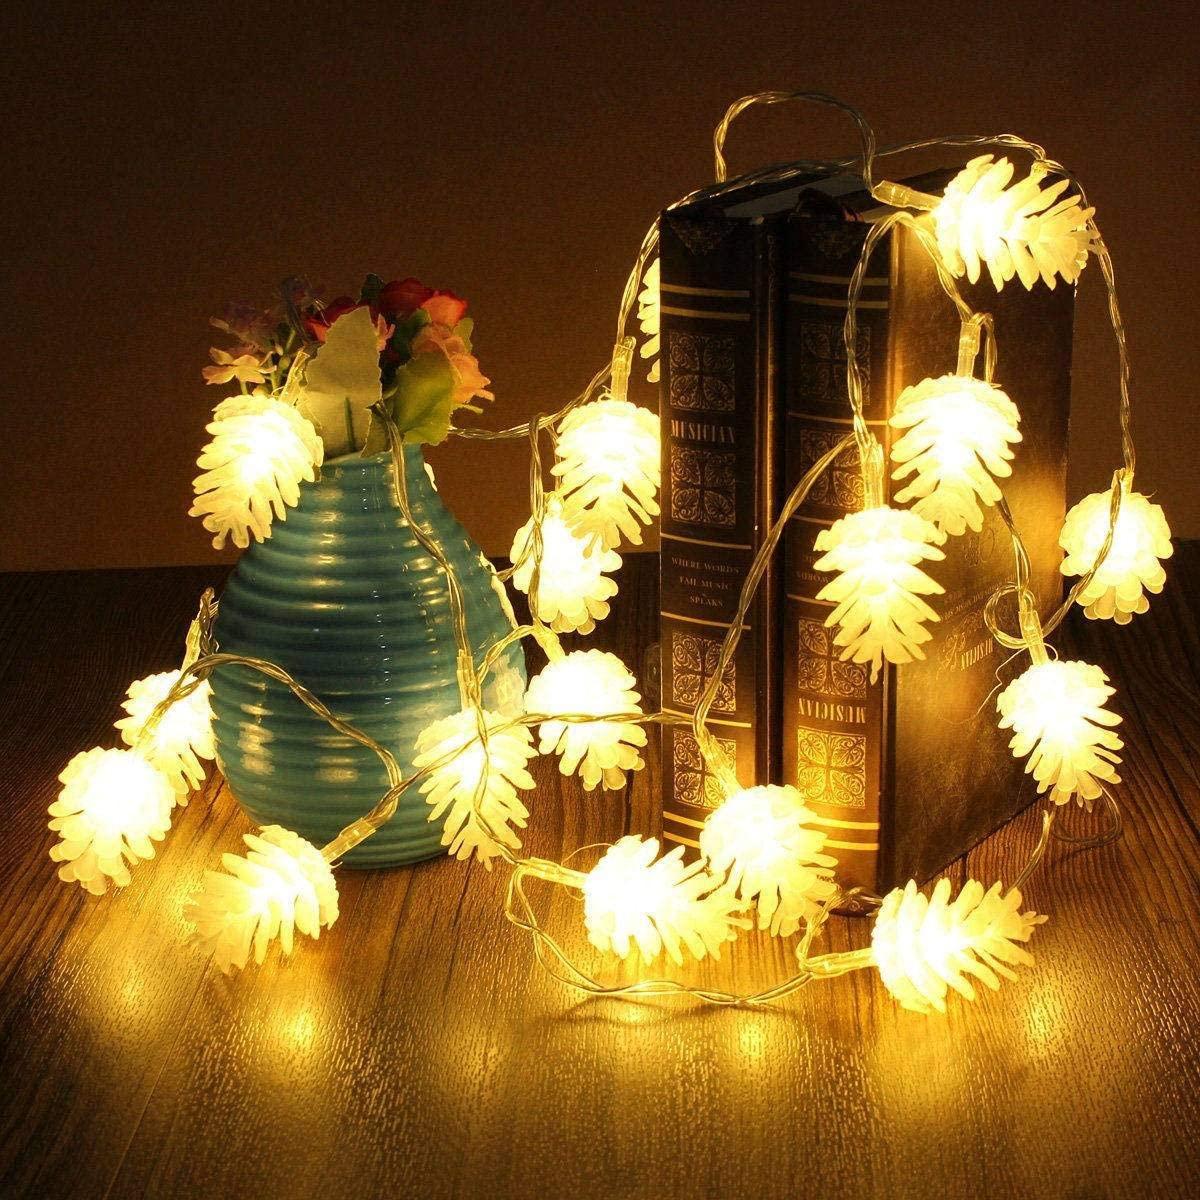 Christmas Tree Decoration Lantern,Pinecone Light Battery Powered Festival Creative Pre-Lit Eco-Friendly Christmas Tree Decoration Lights-A-5m